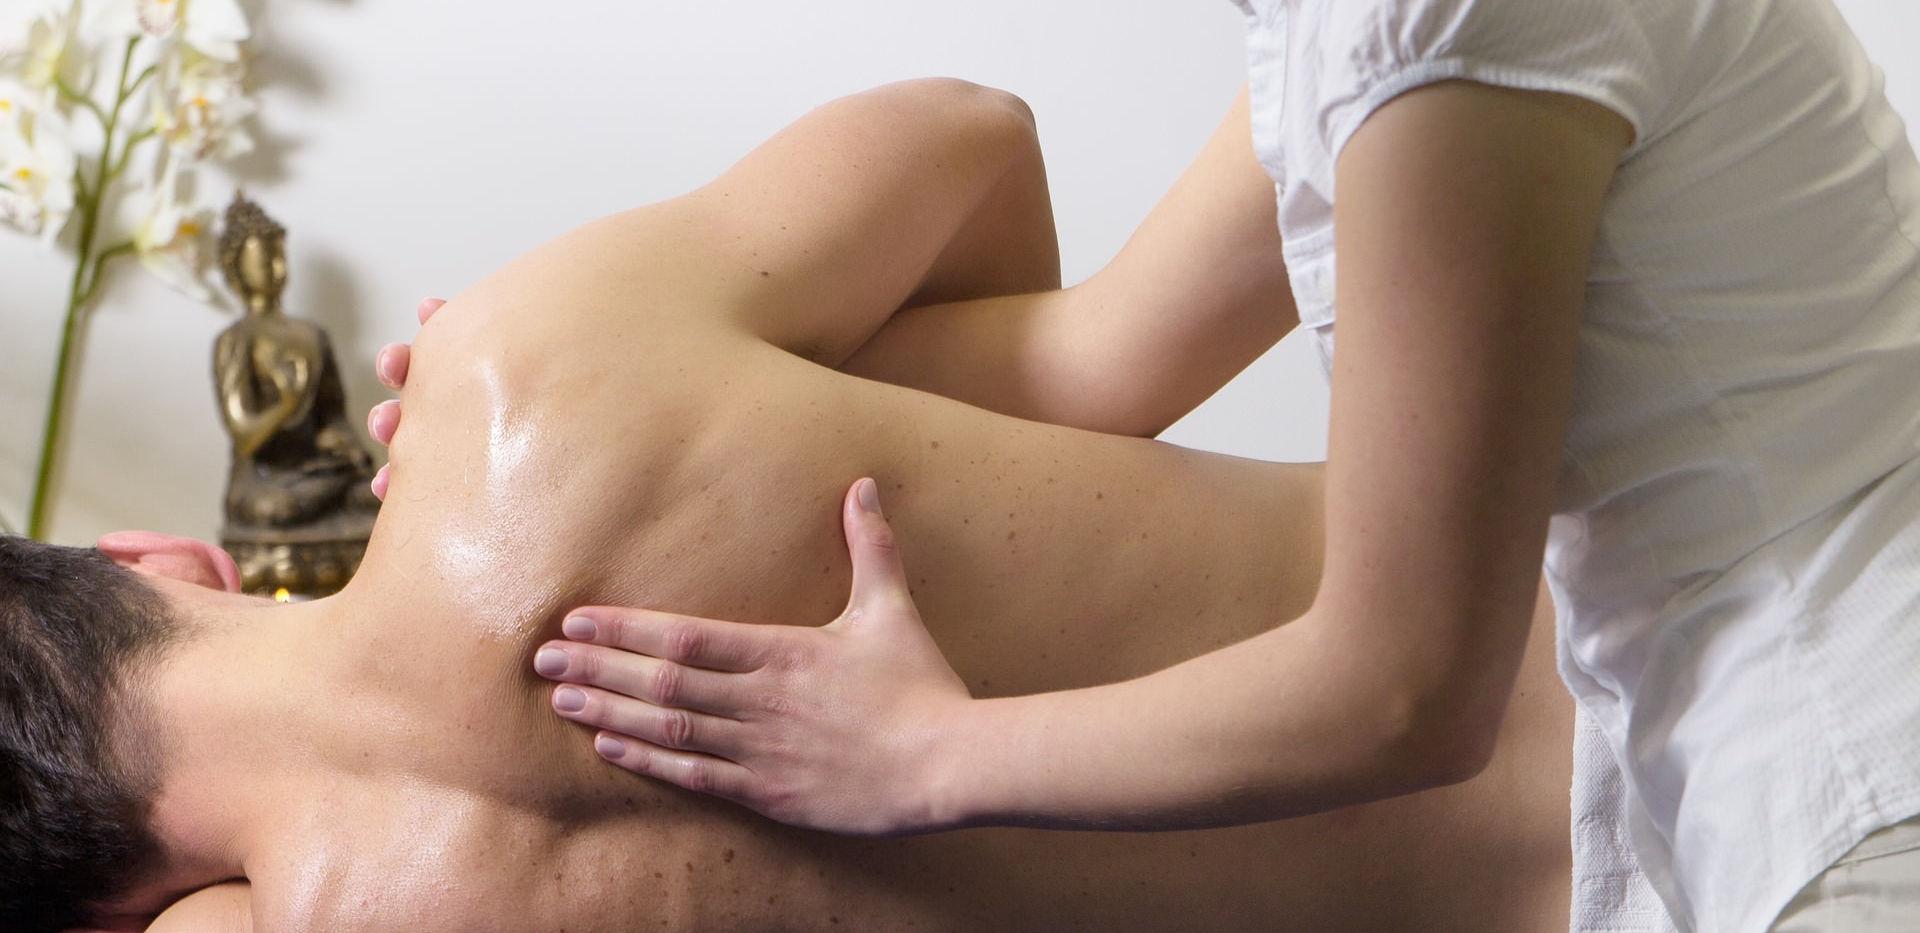 massage-2768833_1920.jpg